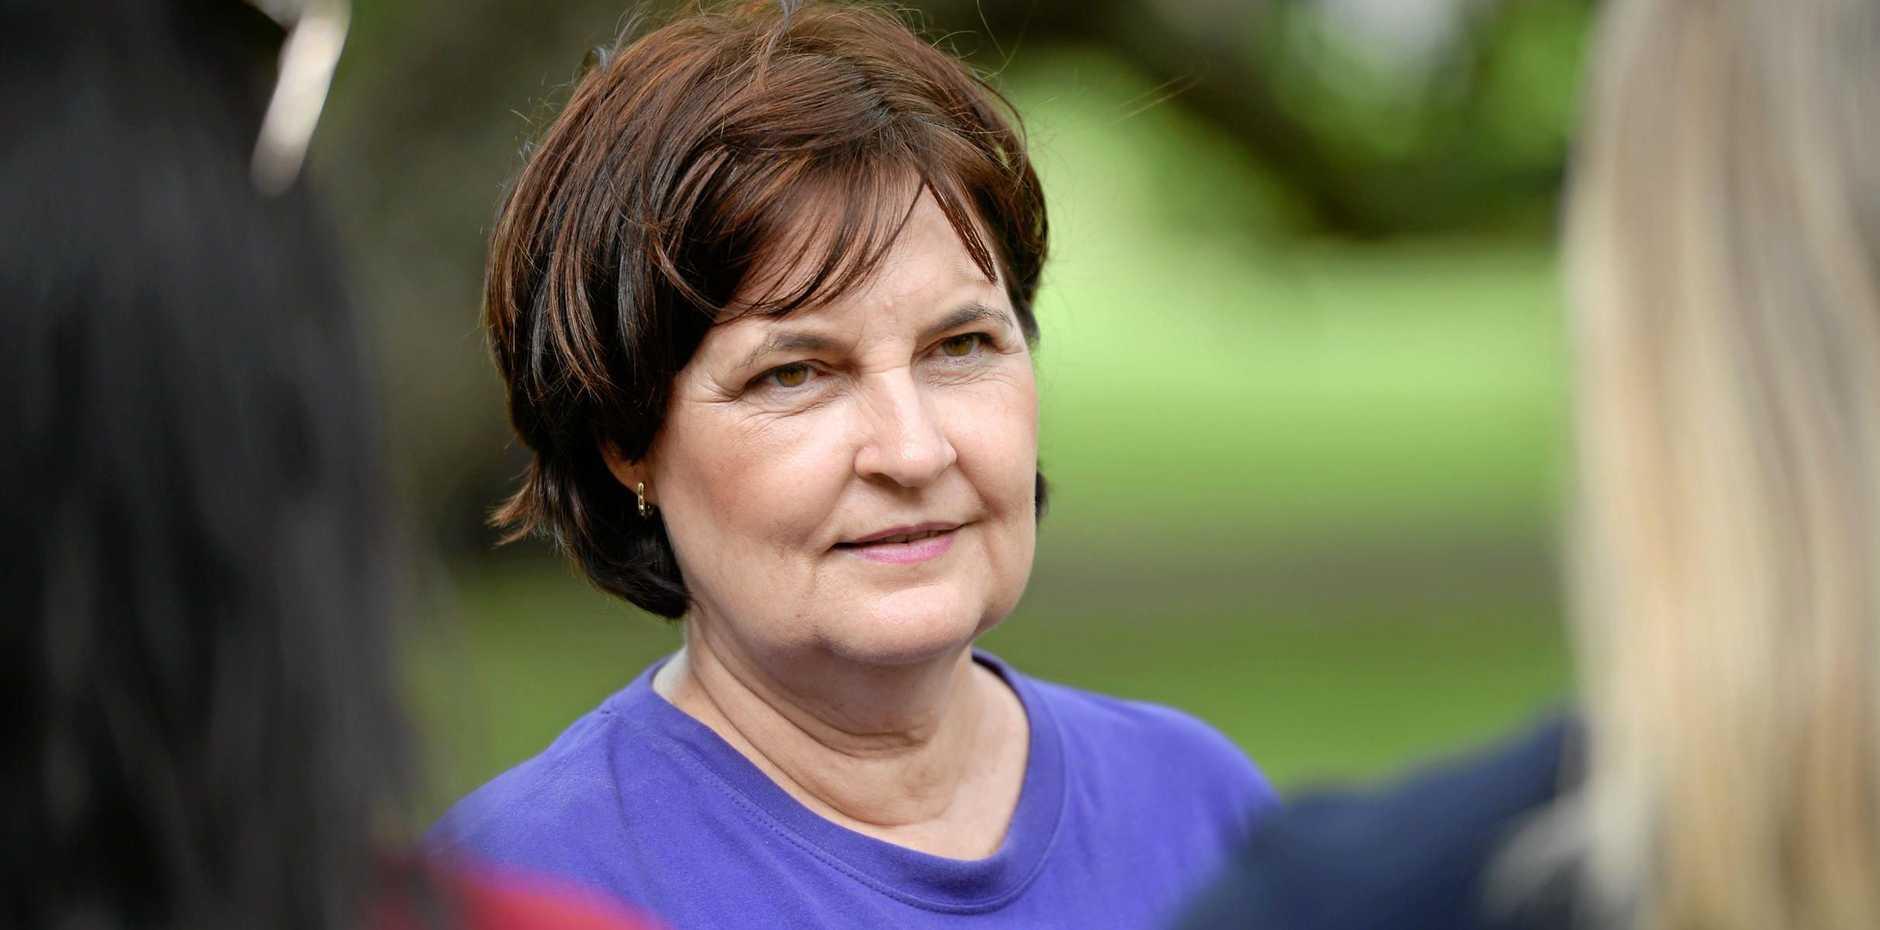 Member for Mackay Julieanne Gilbert chose to vote for new legislation regarding the termination of pregnancy.